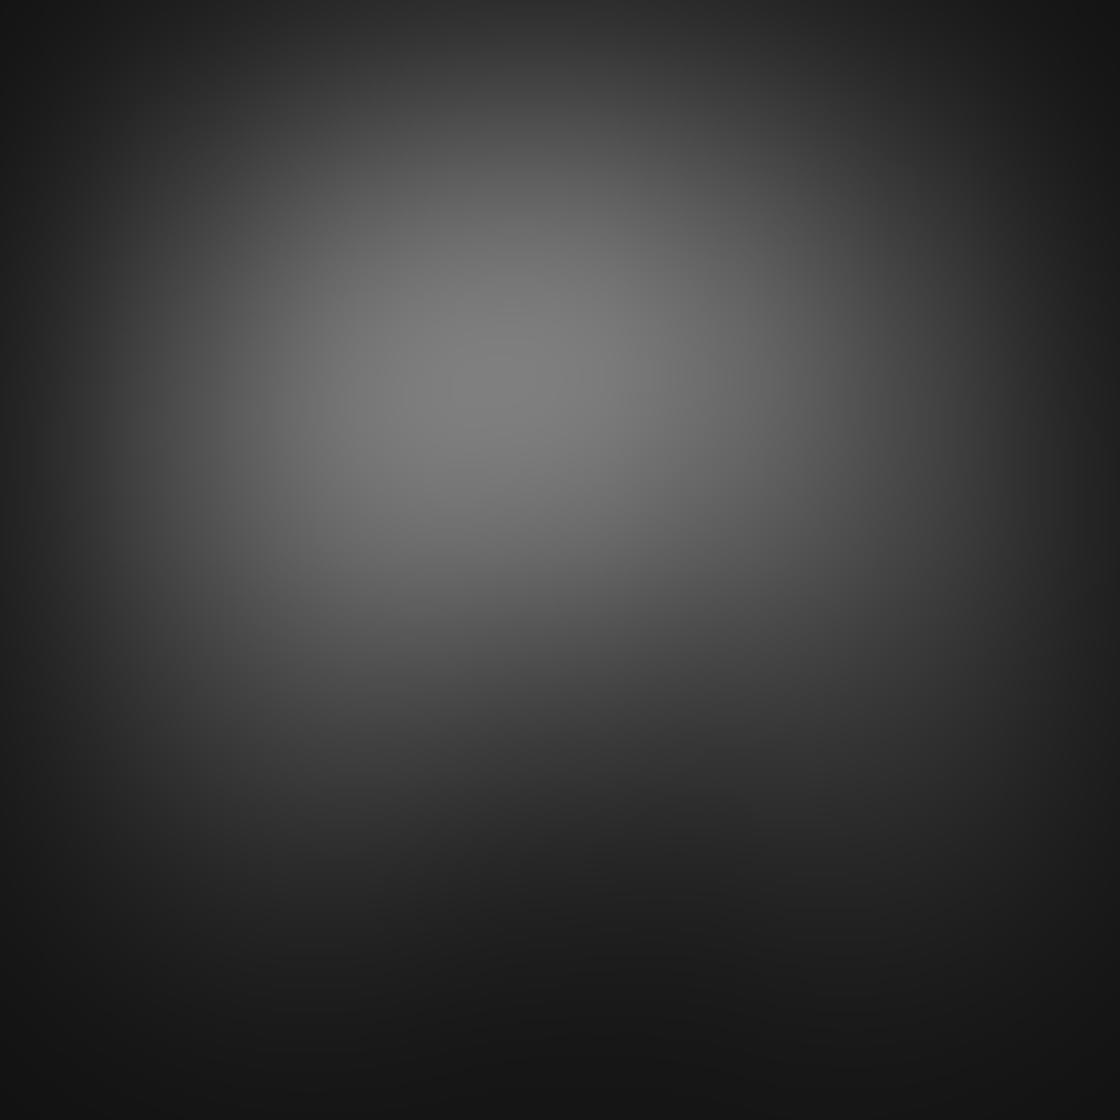 iPhone Photo Black White 4